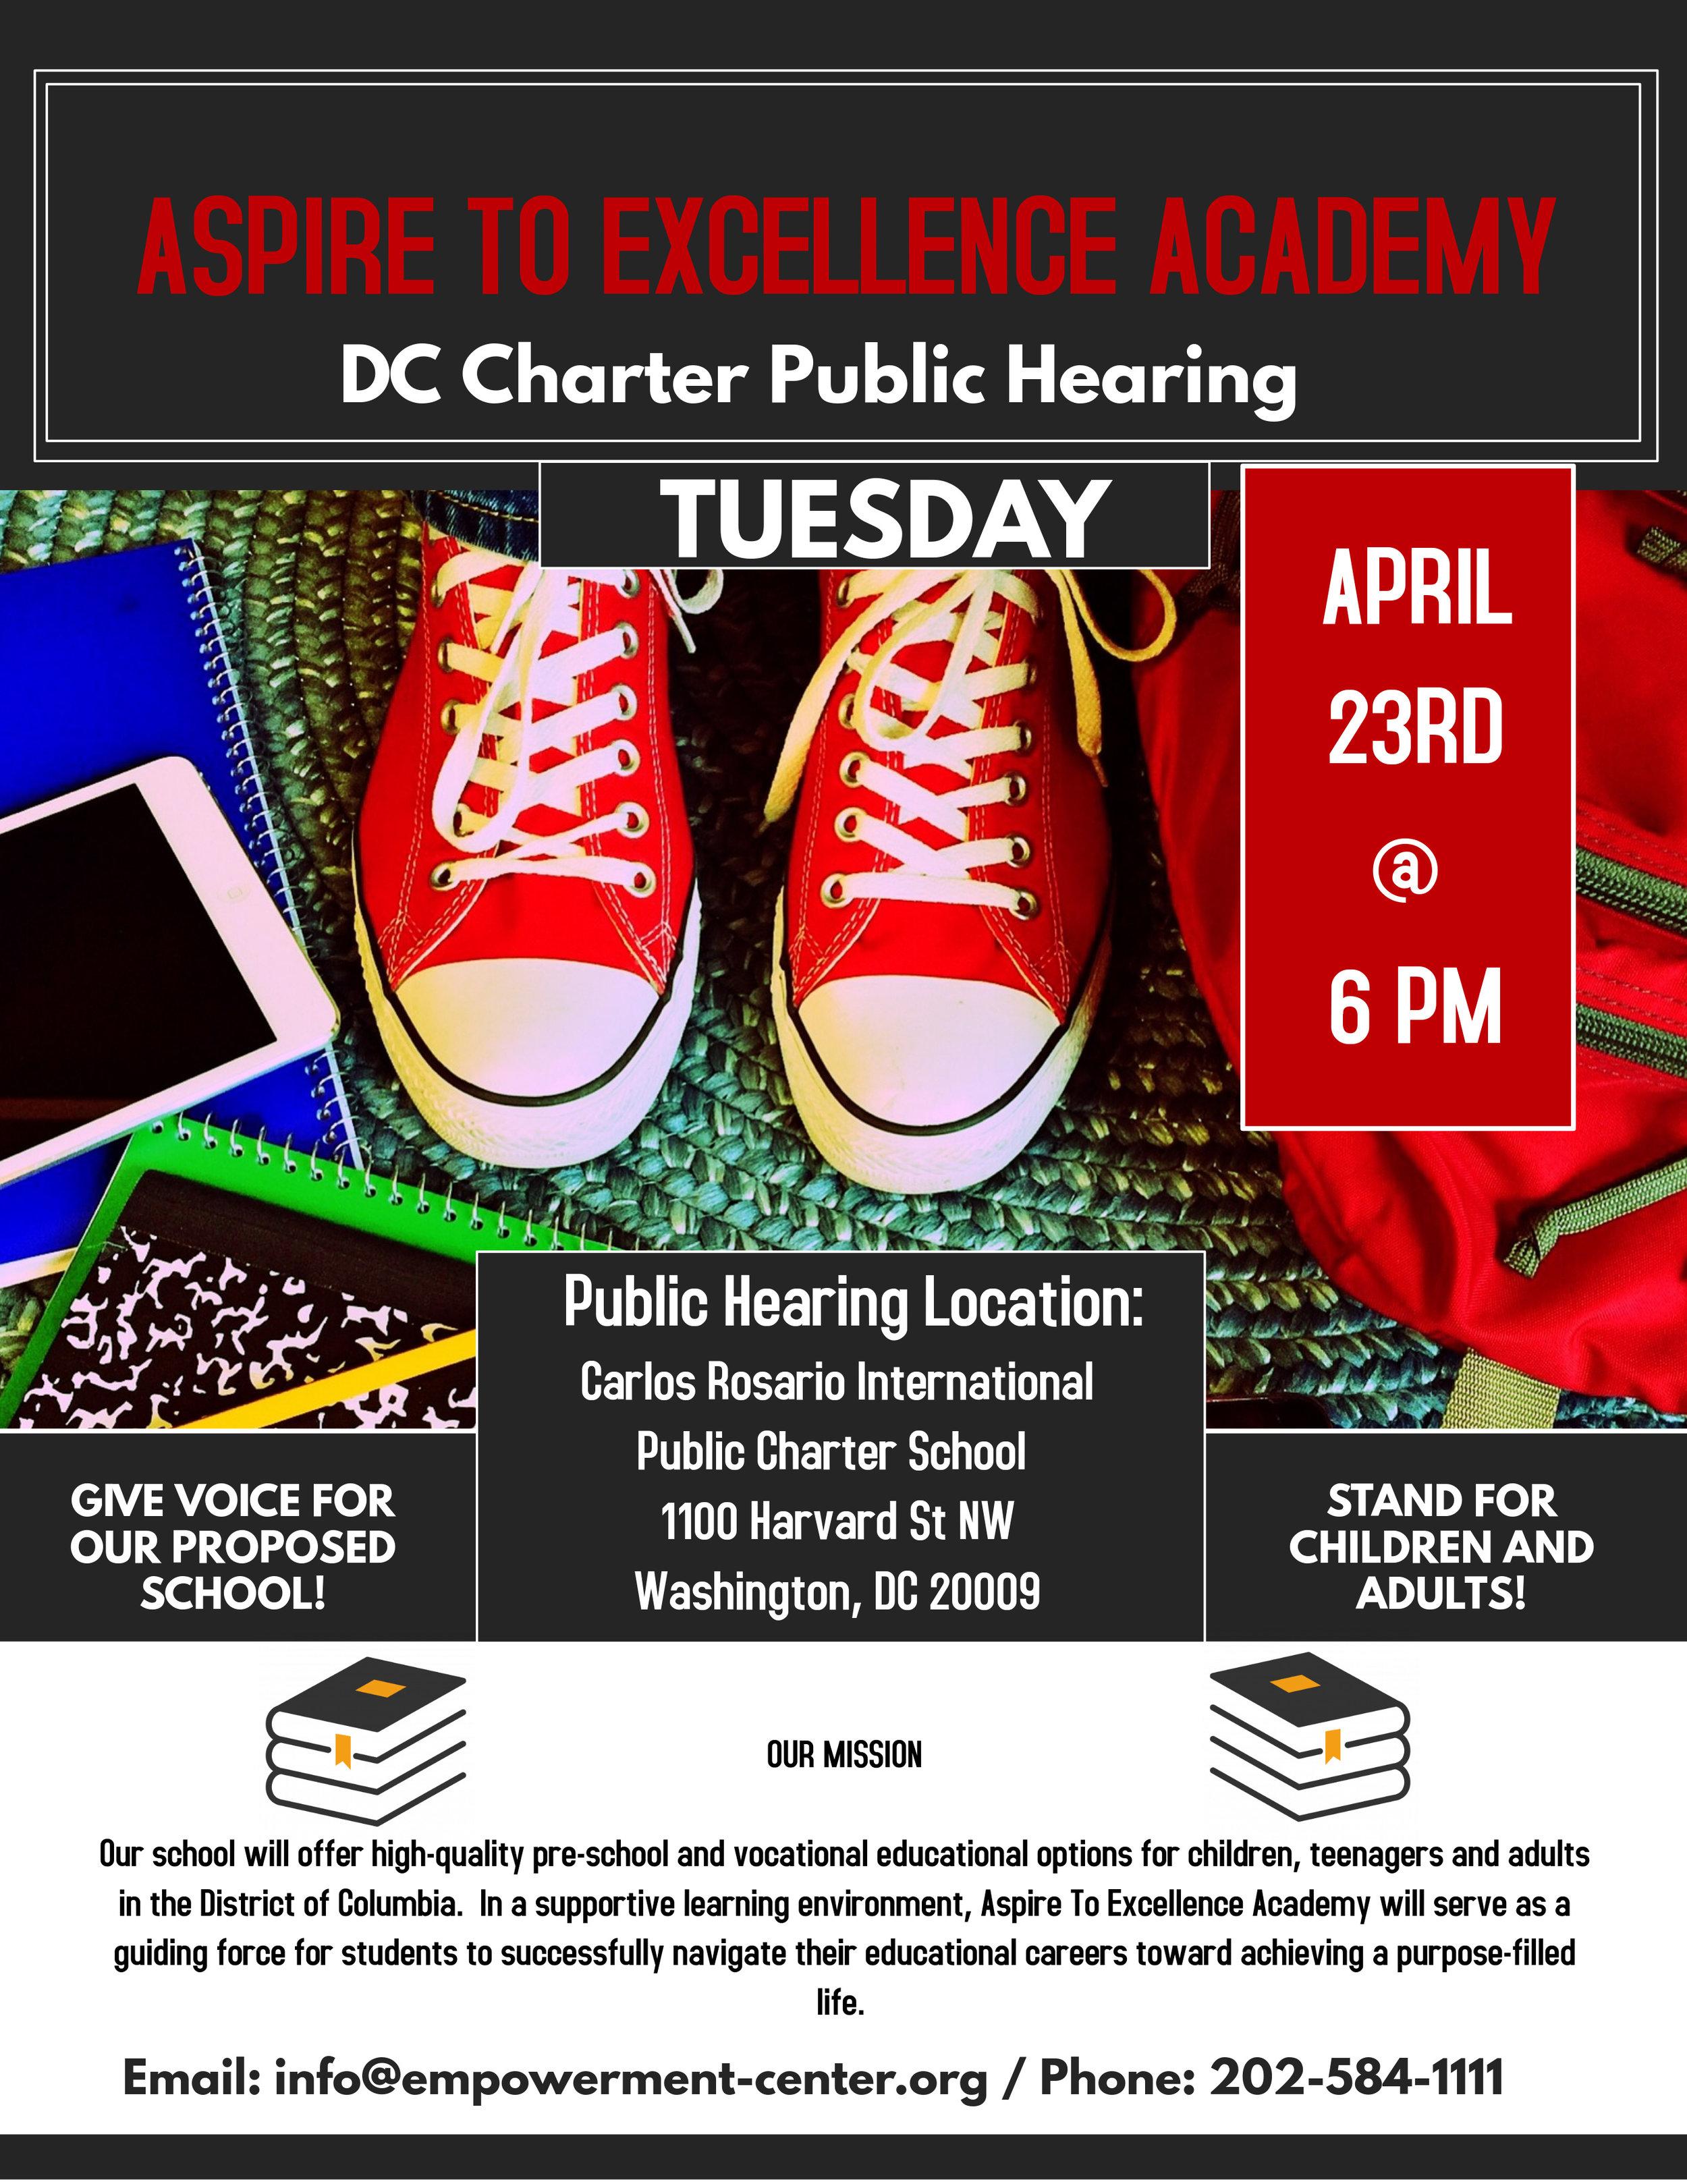 DC Charter Public Hearing Flyer.jpg